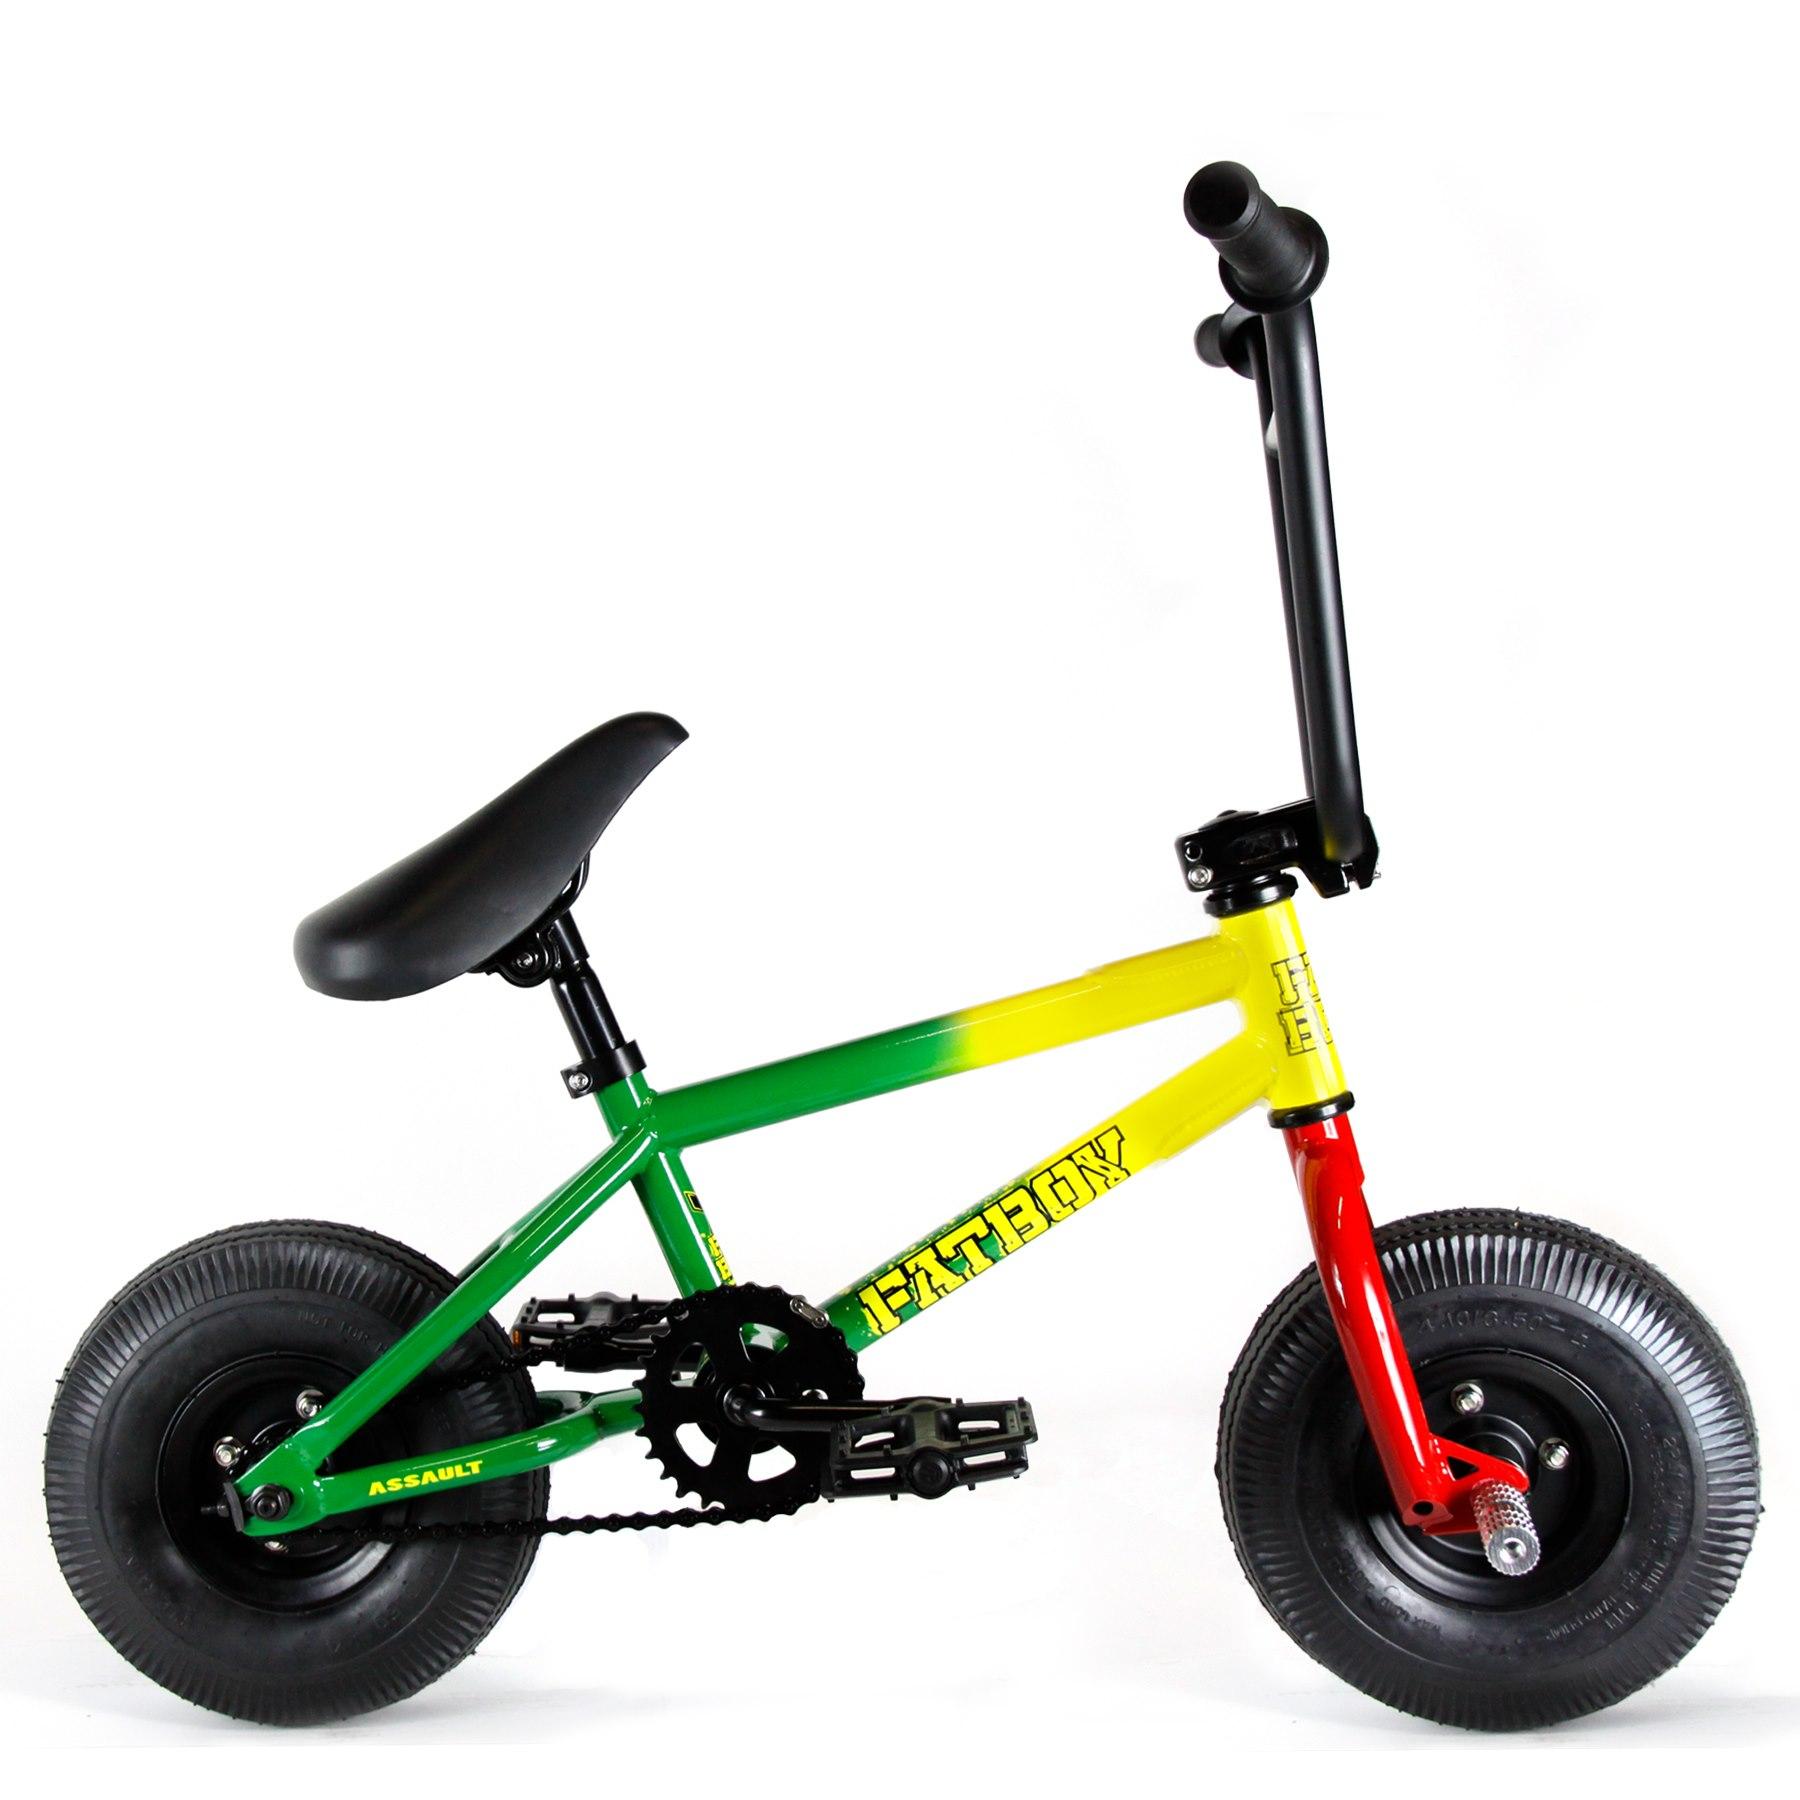 10 Quot Fatboy Mini Bmx Bicycle Freestyle Bike Fat Tires Boy